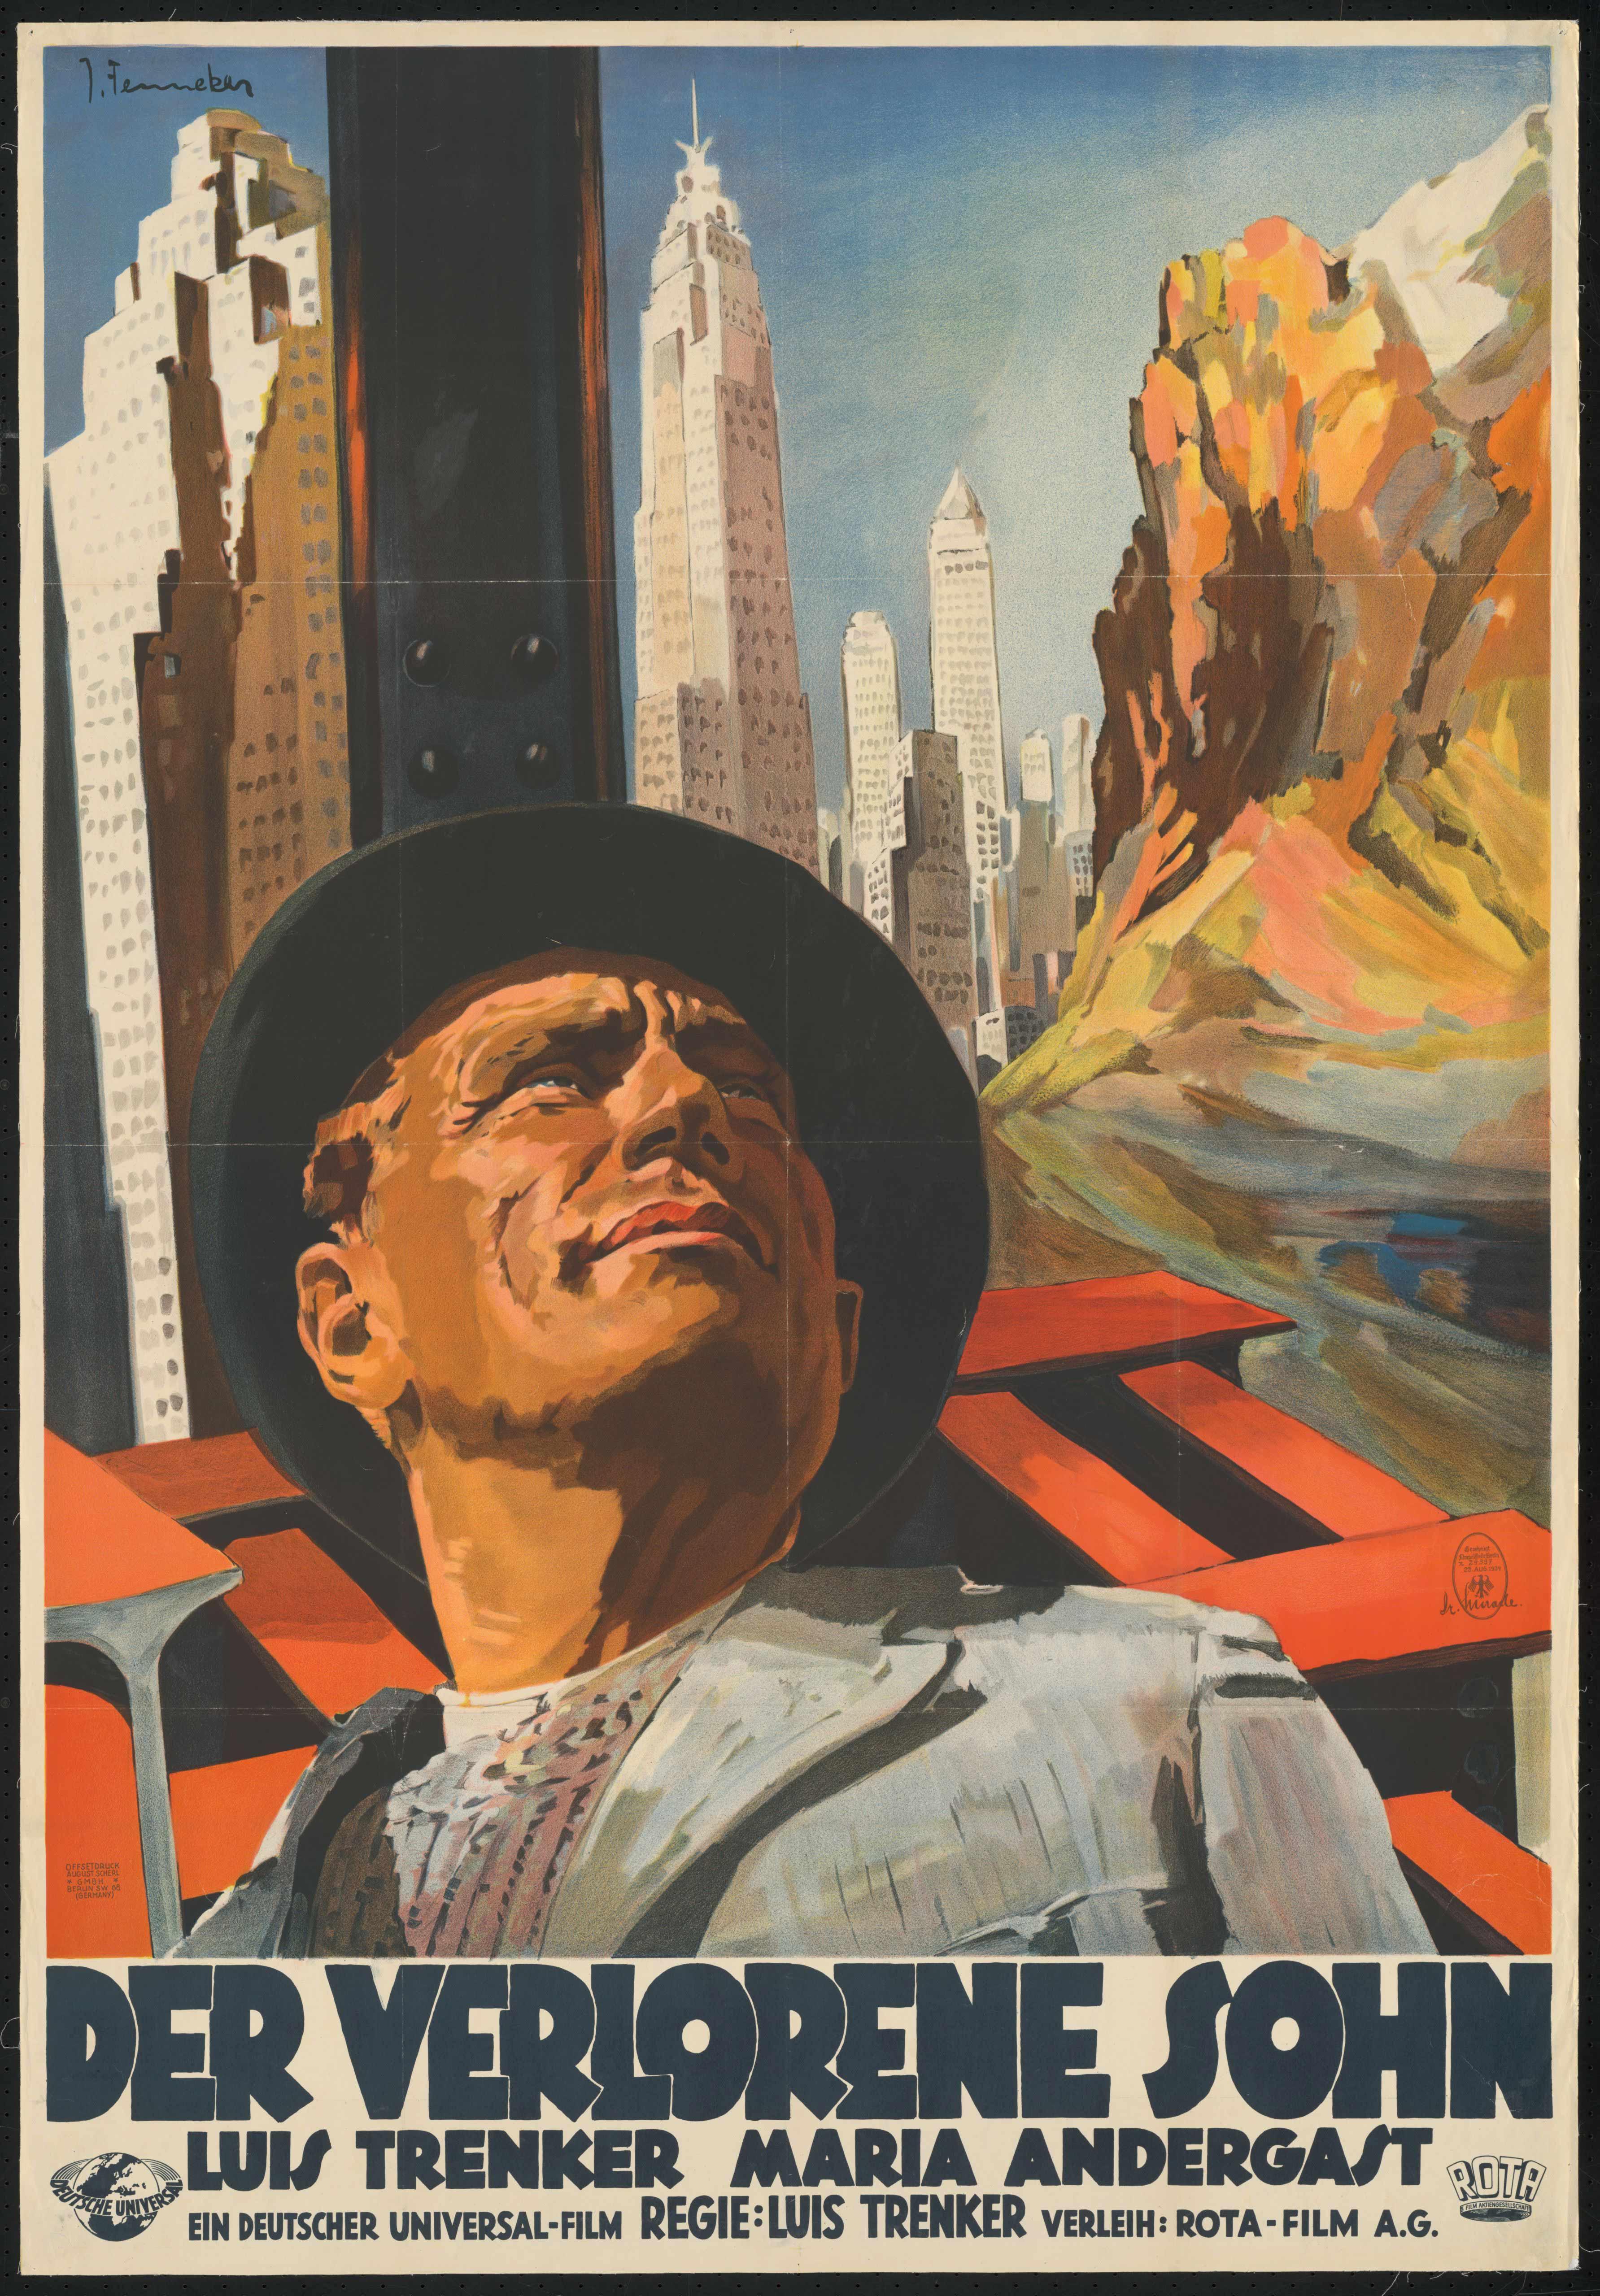 Film poster by Josef Fenneker: Der Verlorene Sohn, Germany 1933, directed by Luis Trenker